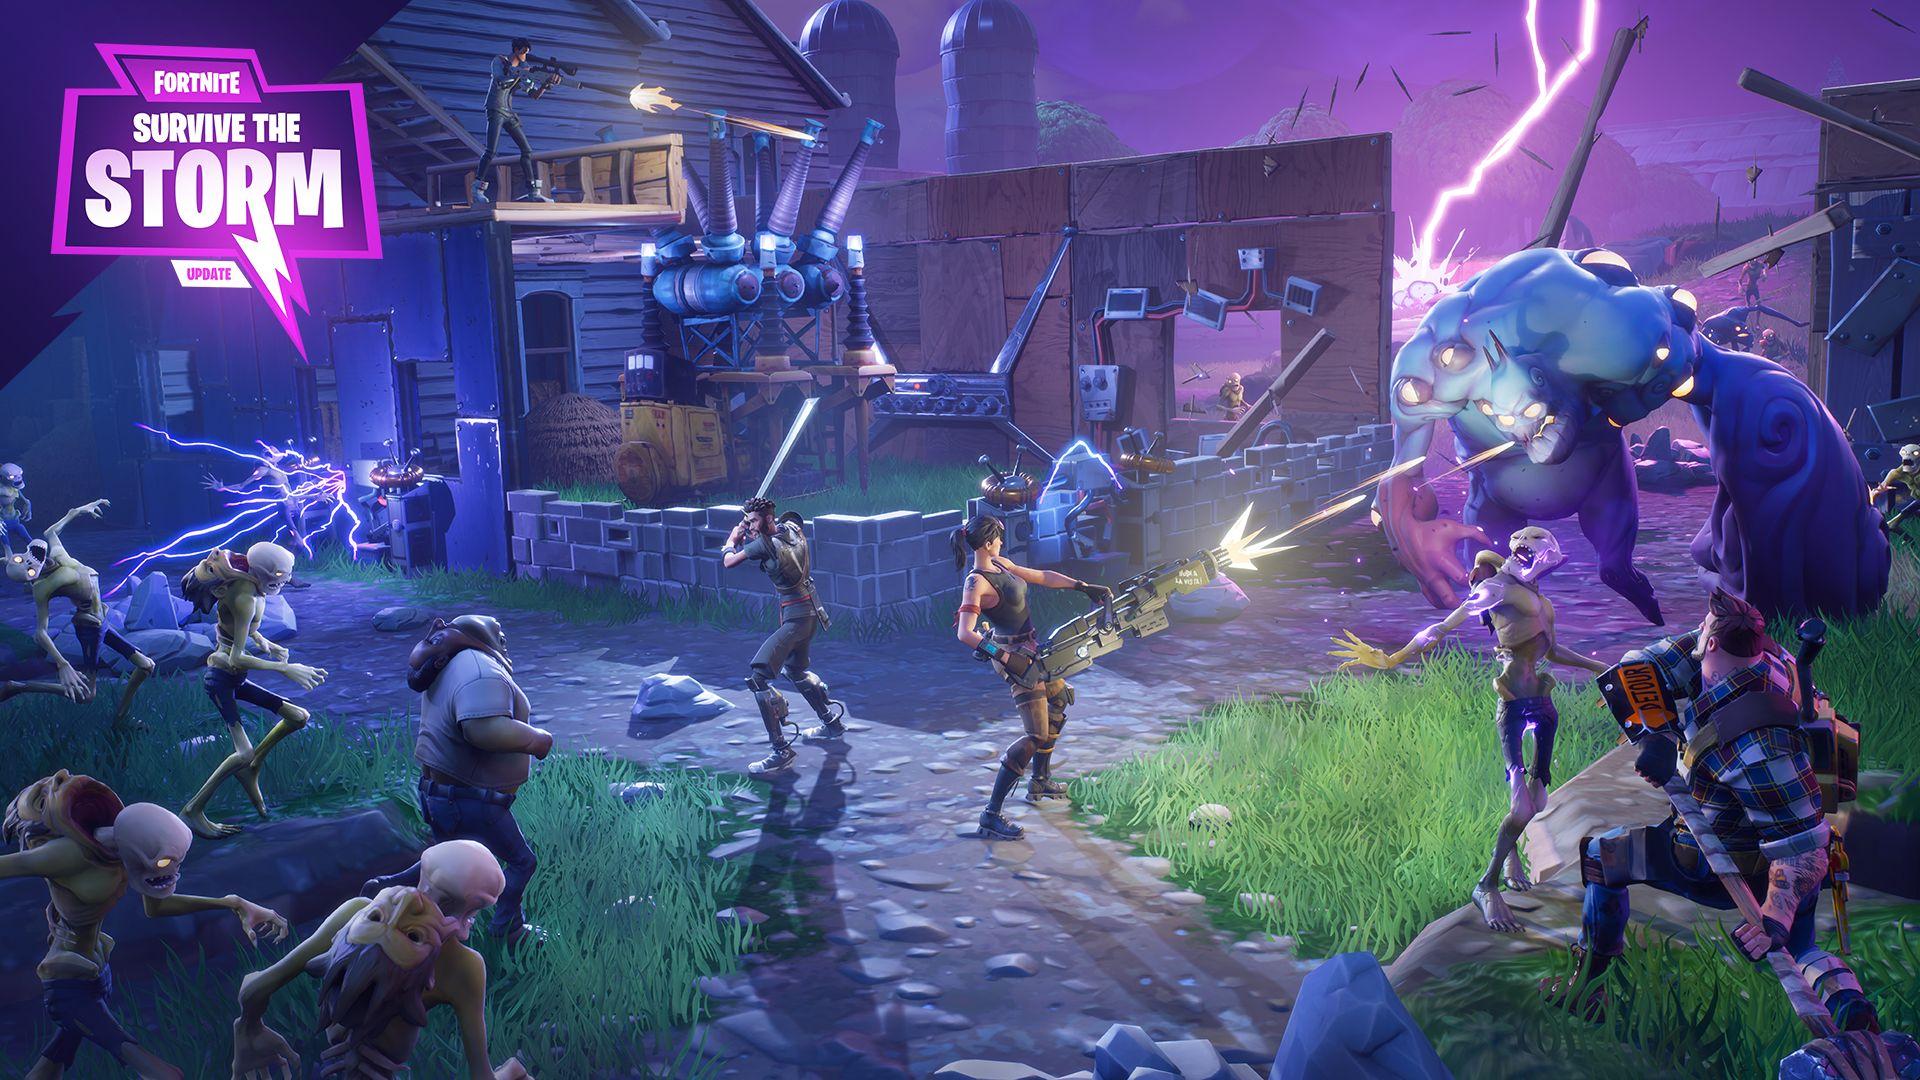 official site fortnite studio epic games launch date july 25 2017 genre battle royale survival shooter business model f2p cash shop - fortnite original release date